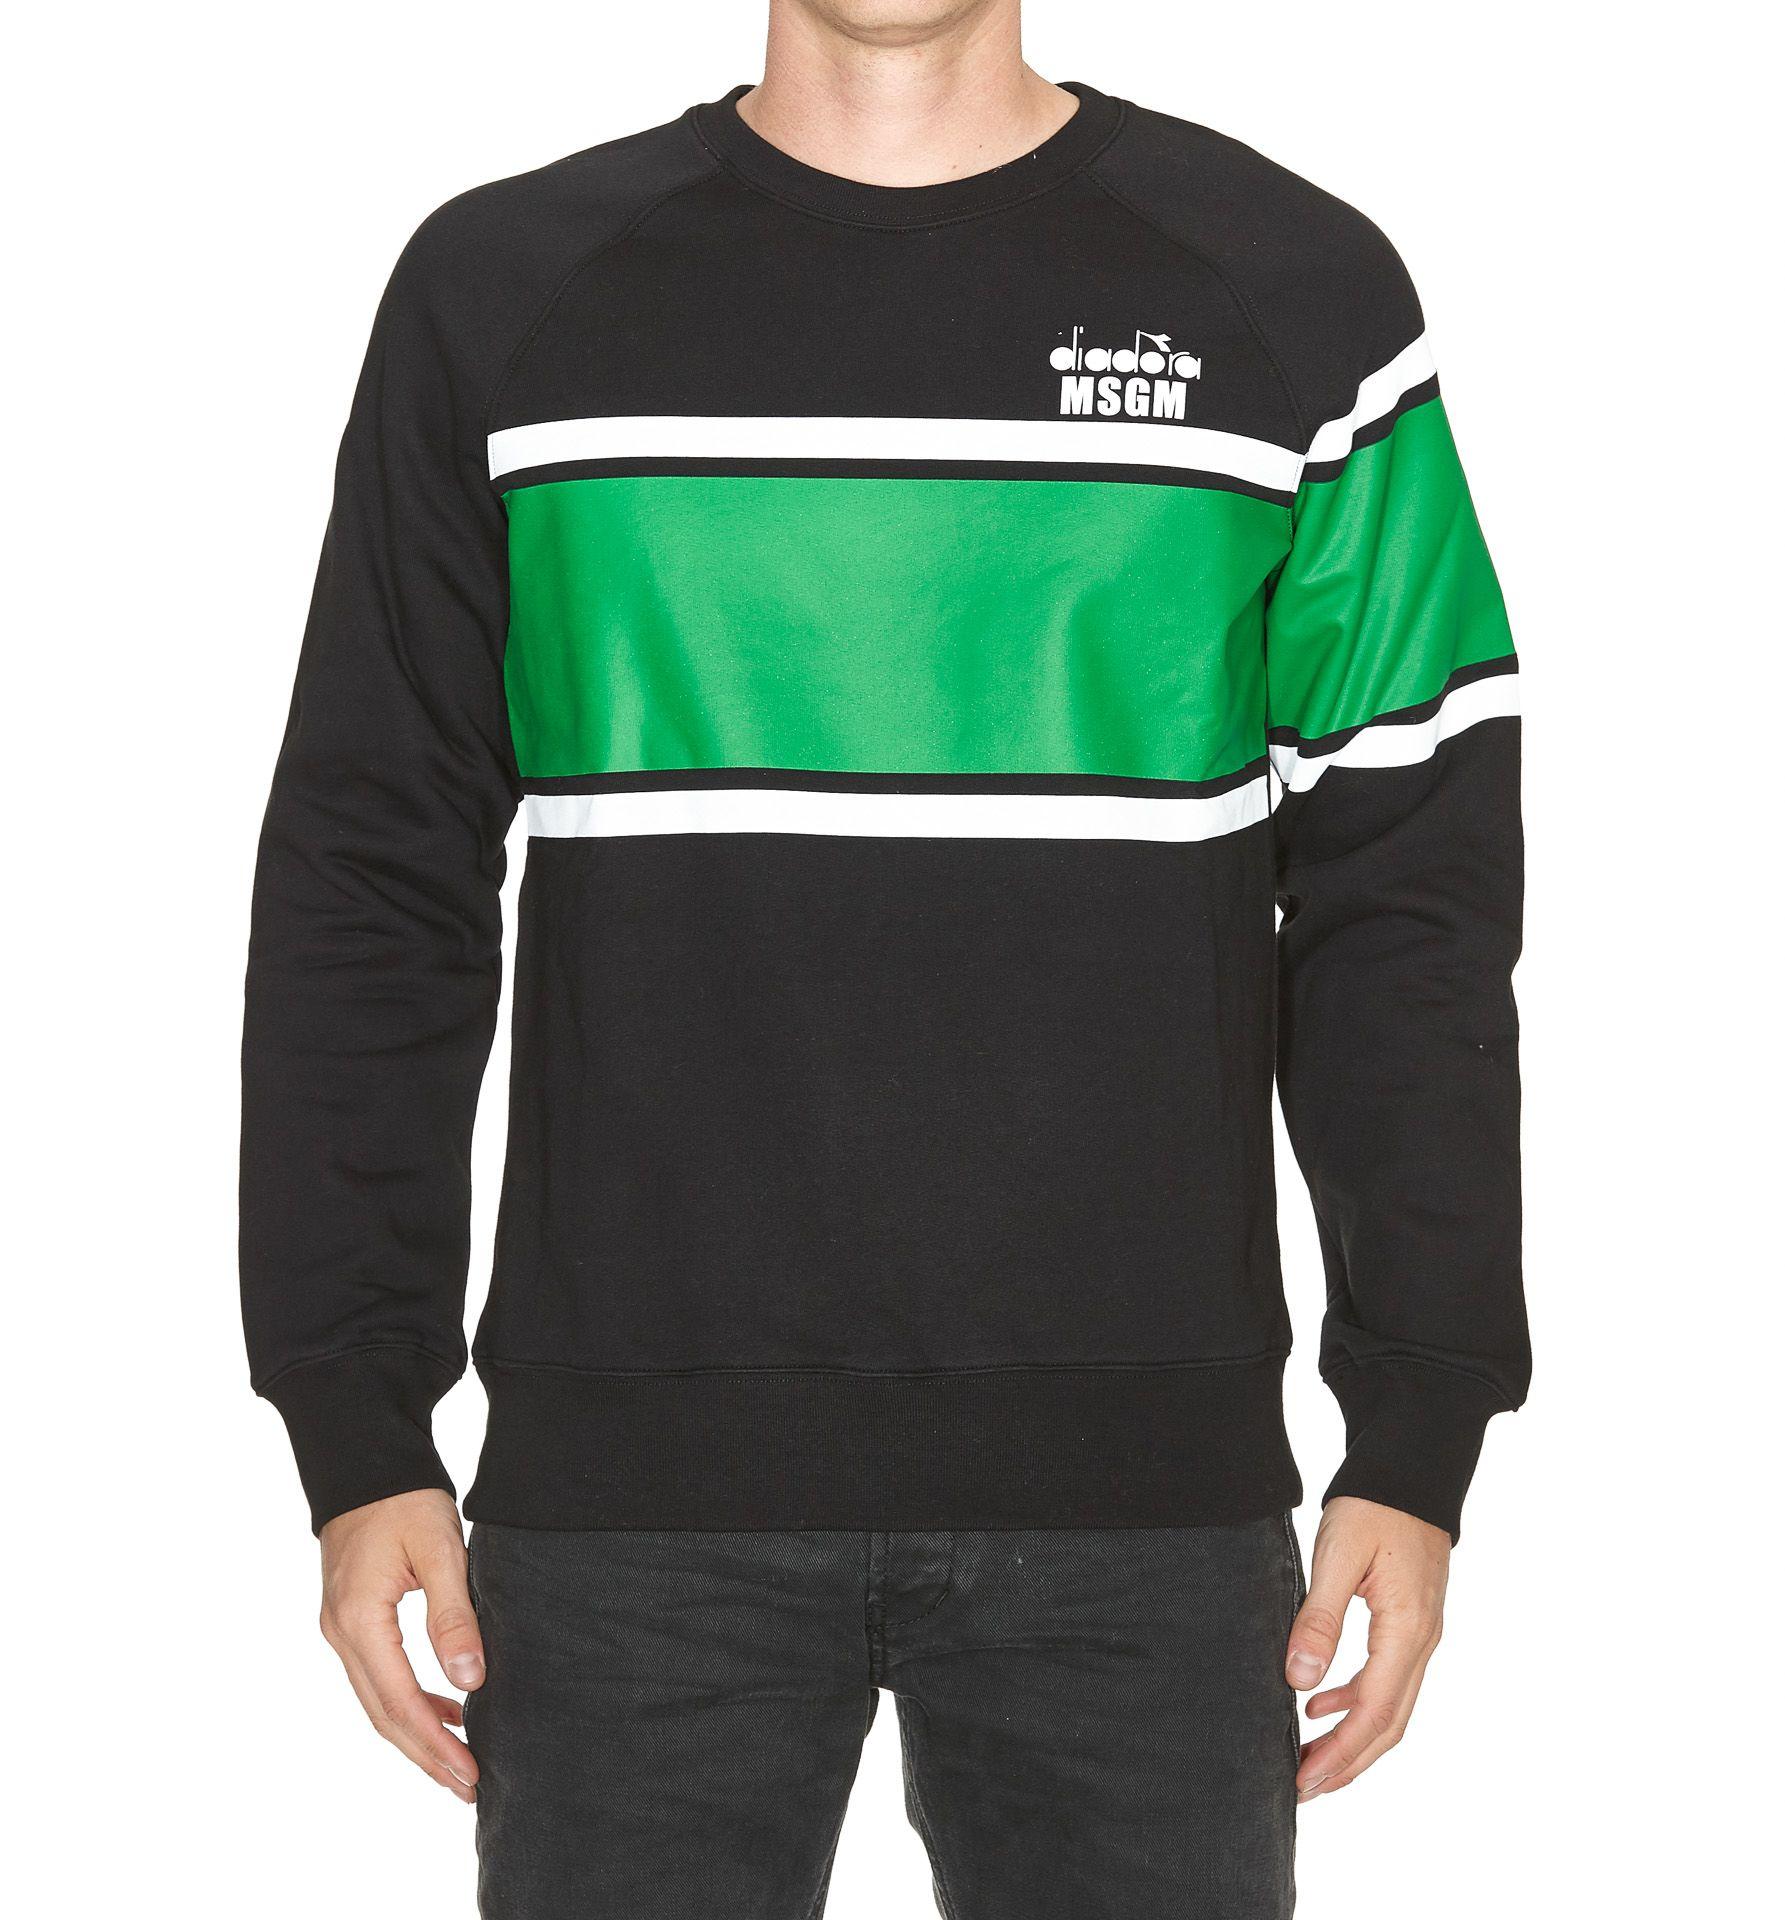 Msgm Sweatshirt